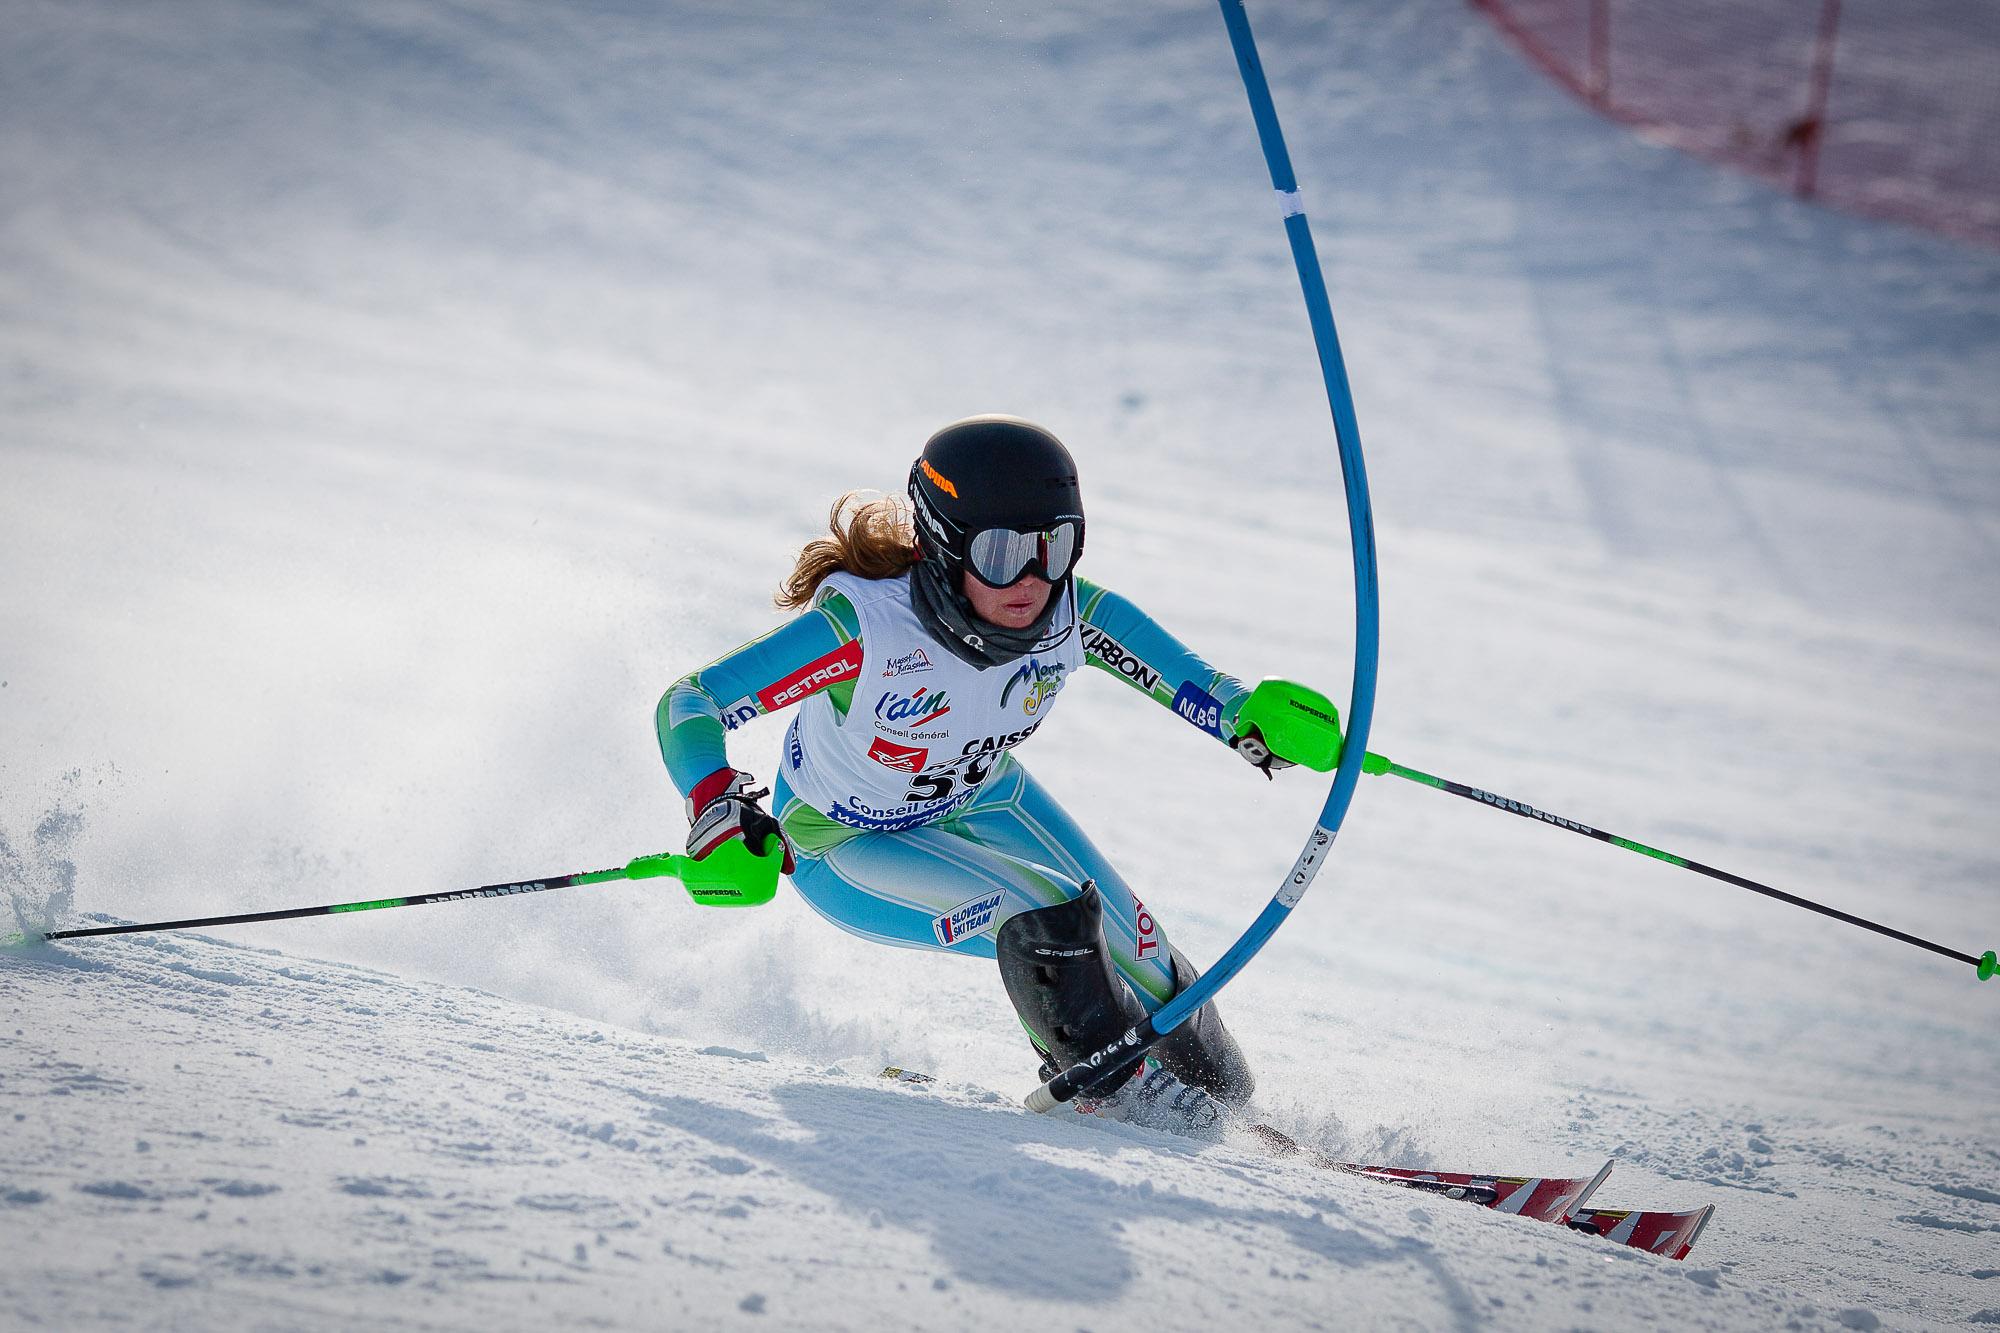 Coupe_Europe_ski_dames-439.jpg